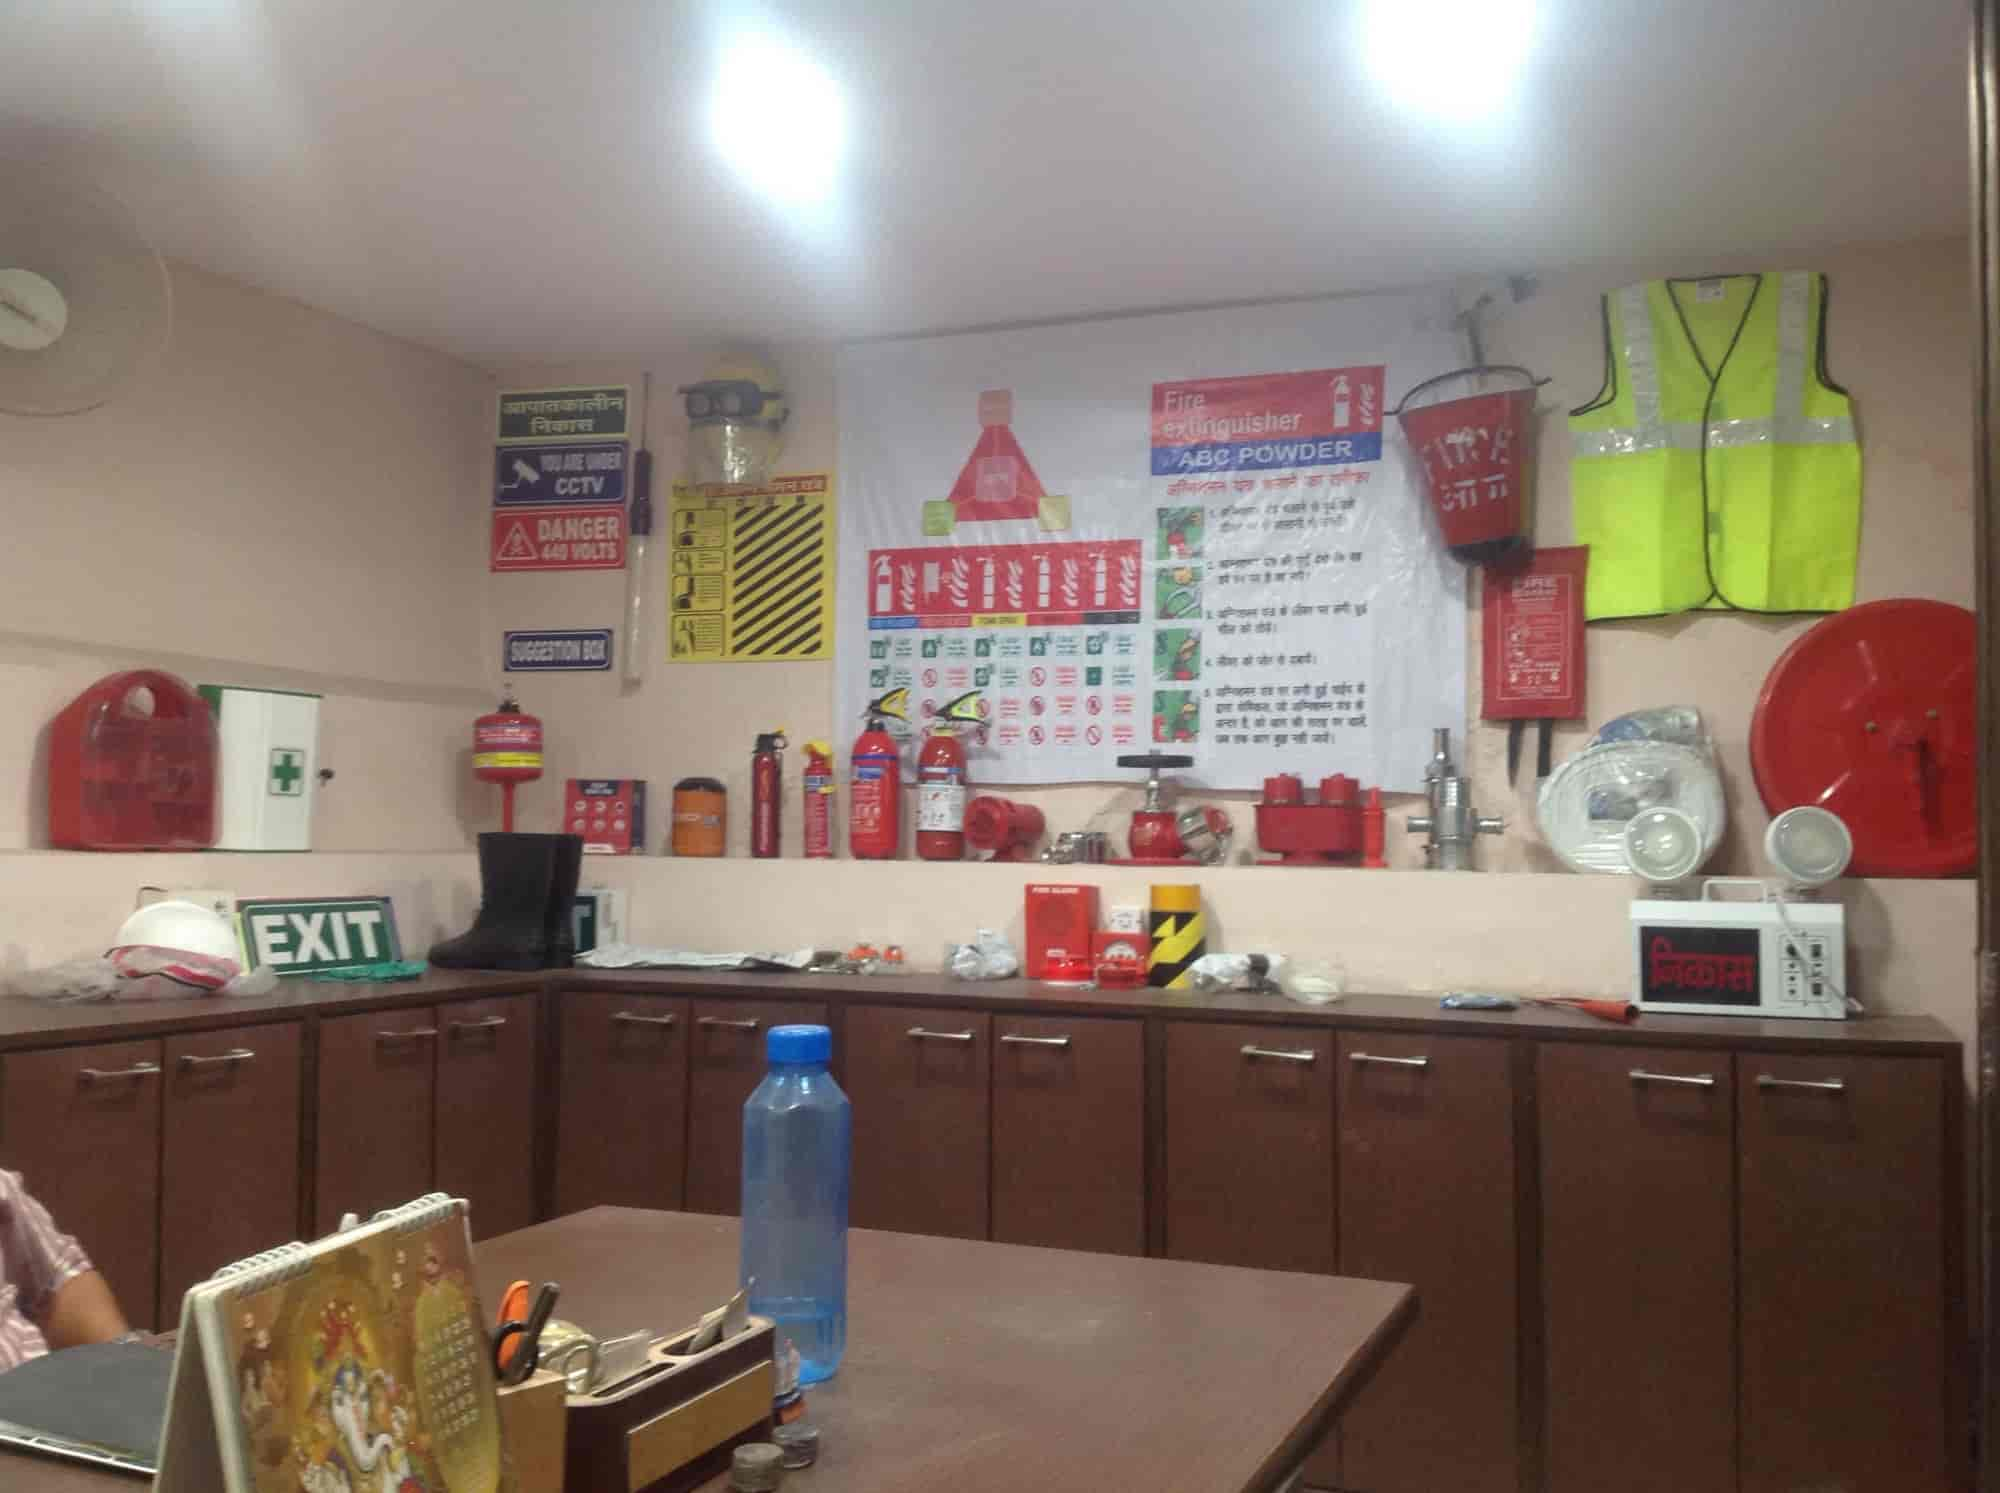 Firefox, Vaishali Nagar - Fire Extinguisher Dealers in Jaipur - Justdial